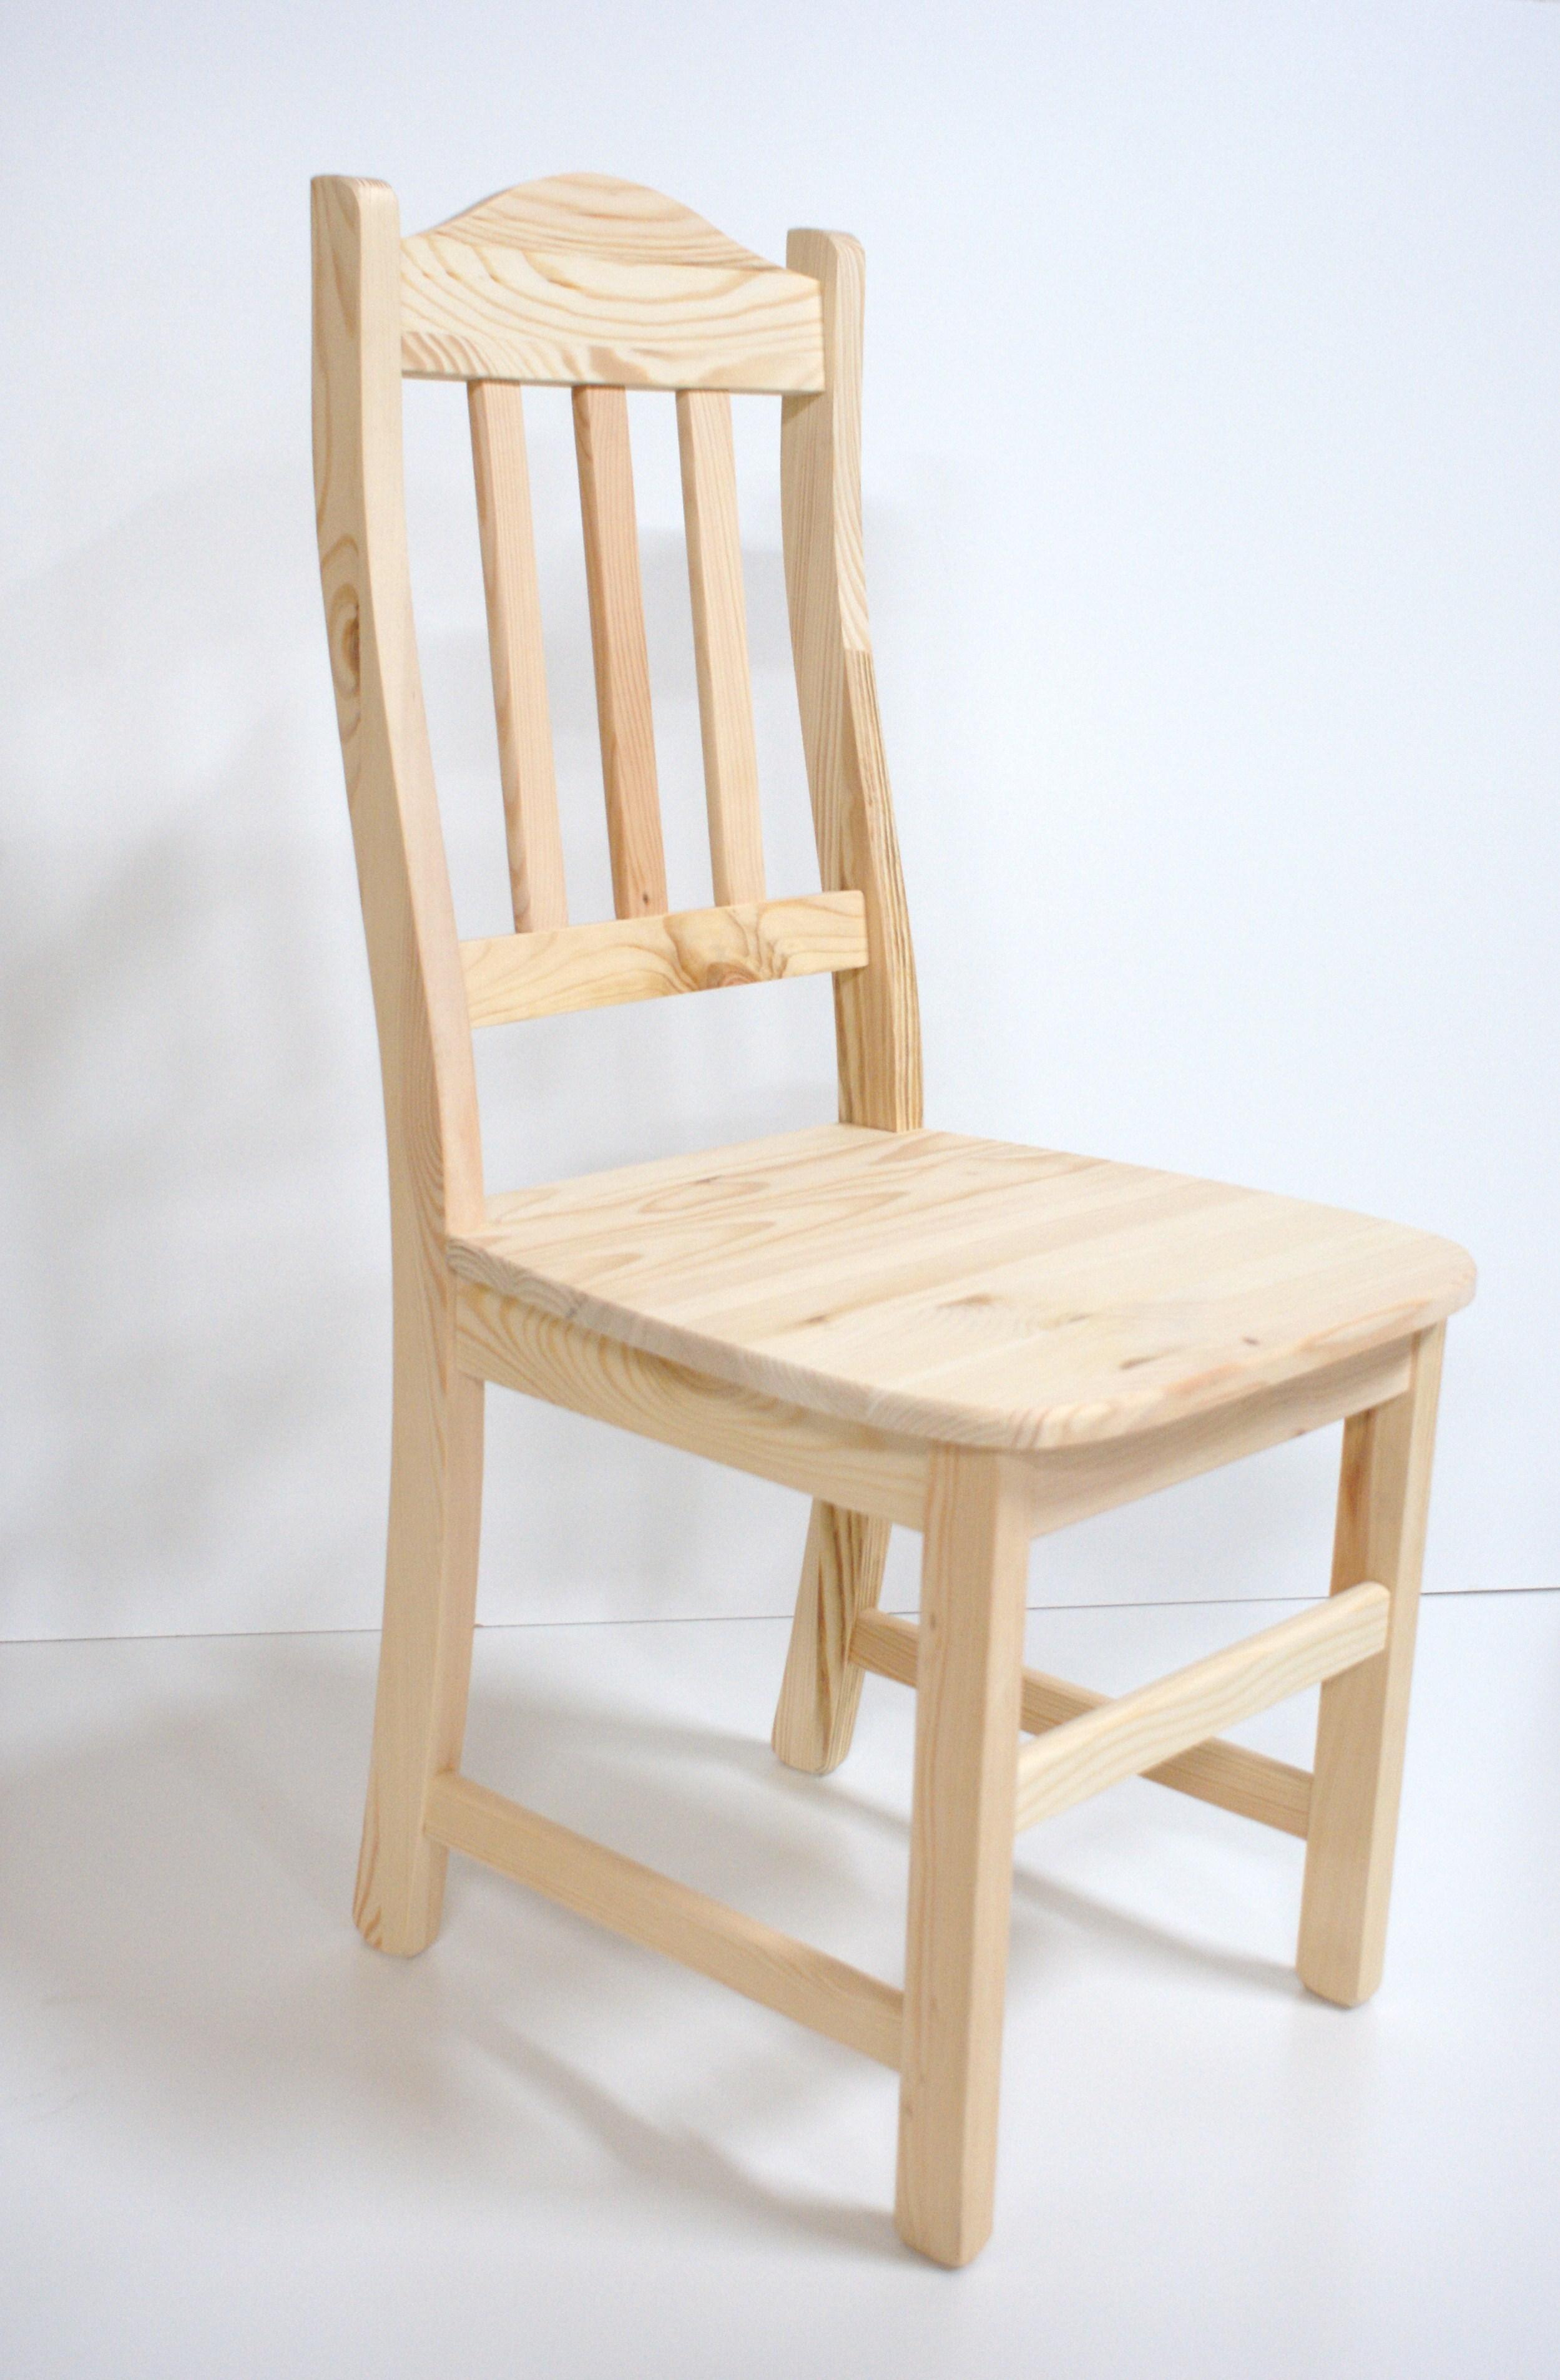 Blank houten eetkamerstoel Groningen   Houten stoelen   Grenenhoeve